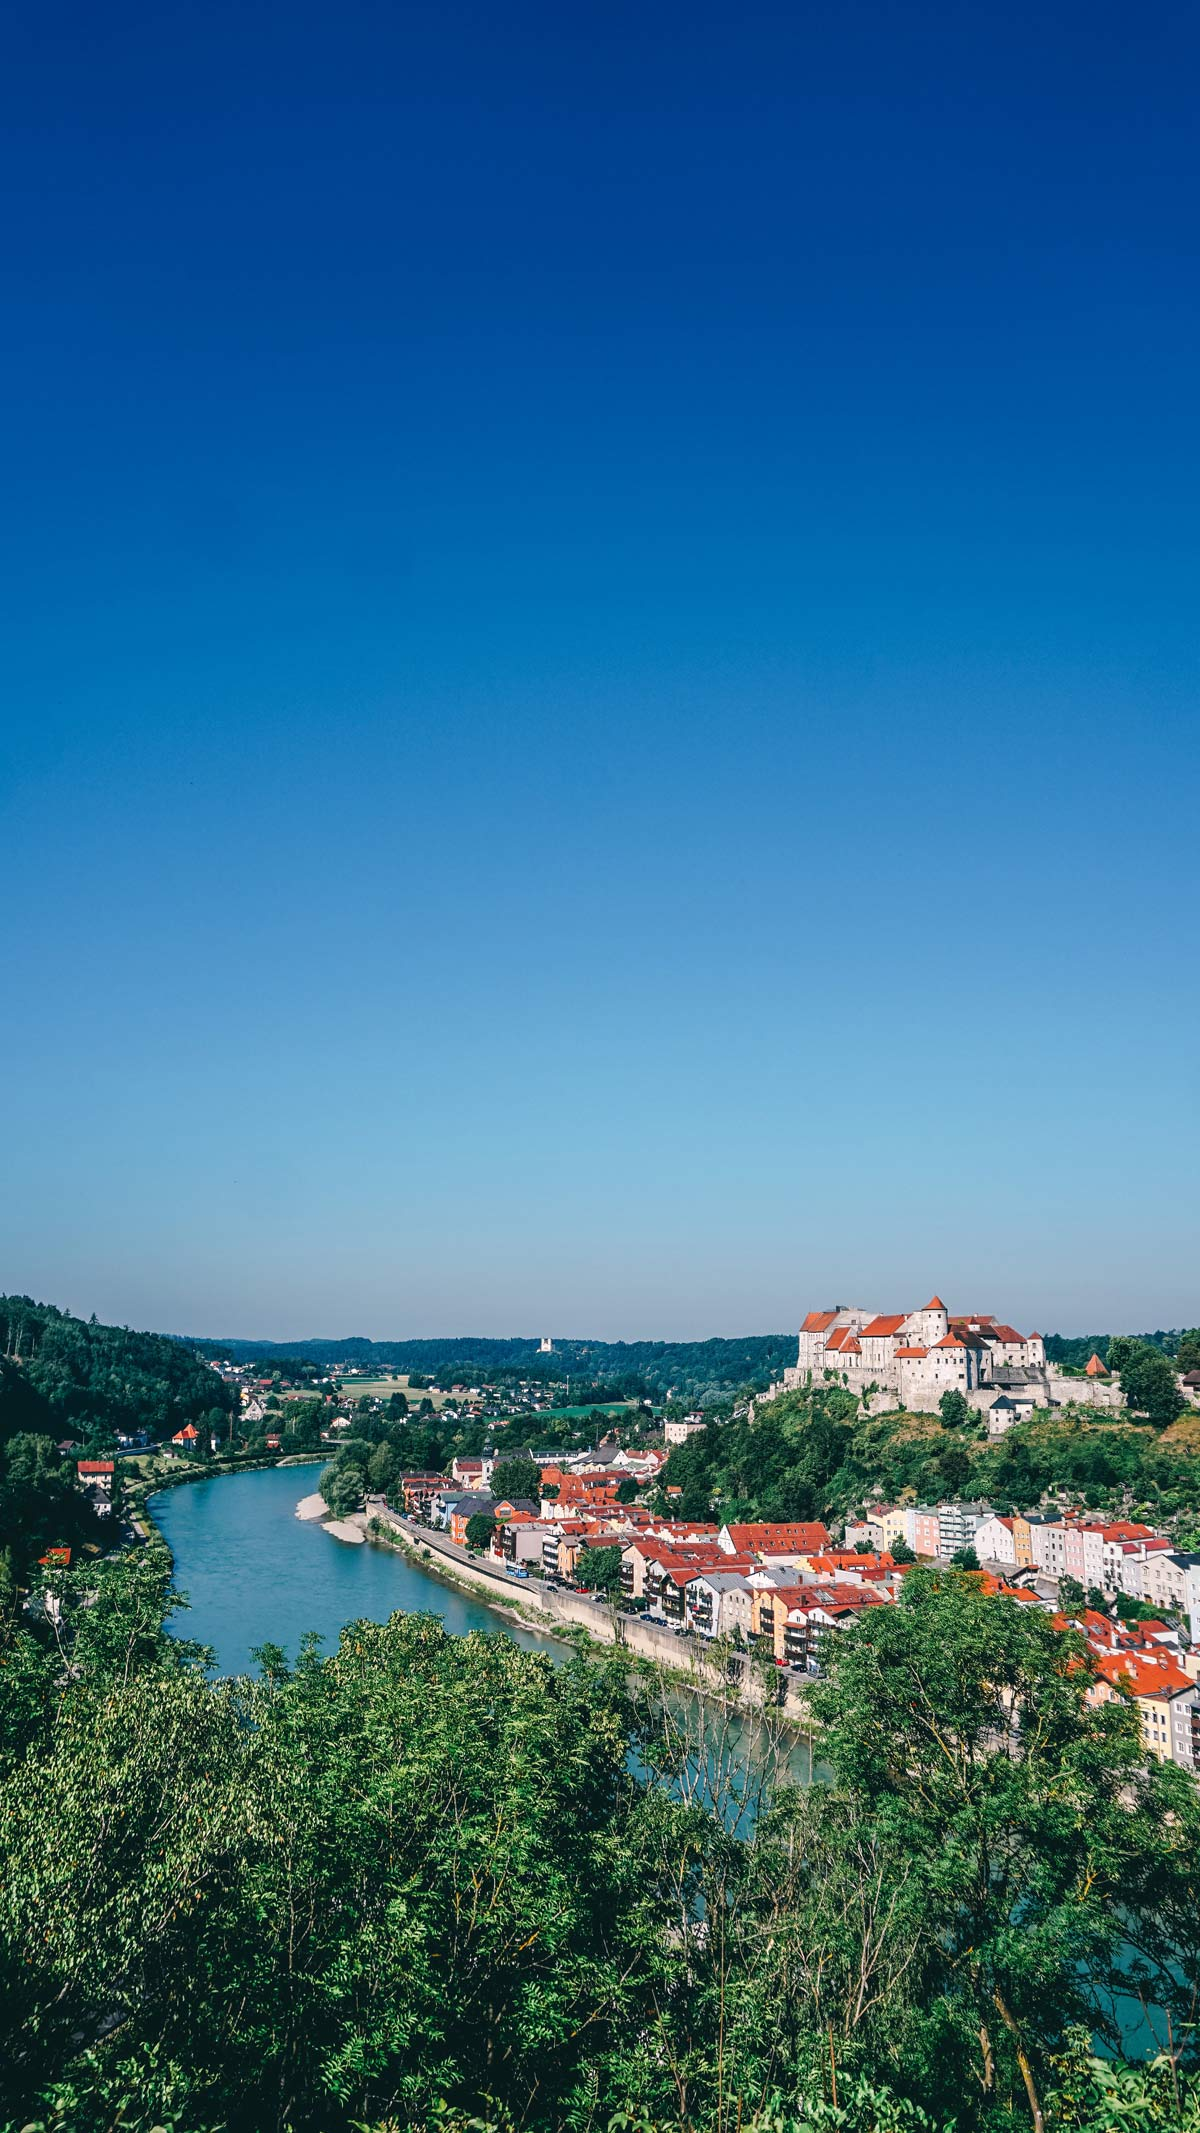 Burghause Ausblick Burg Aussicht